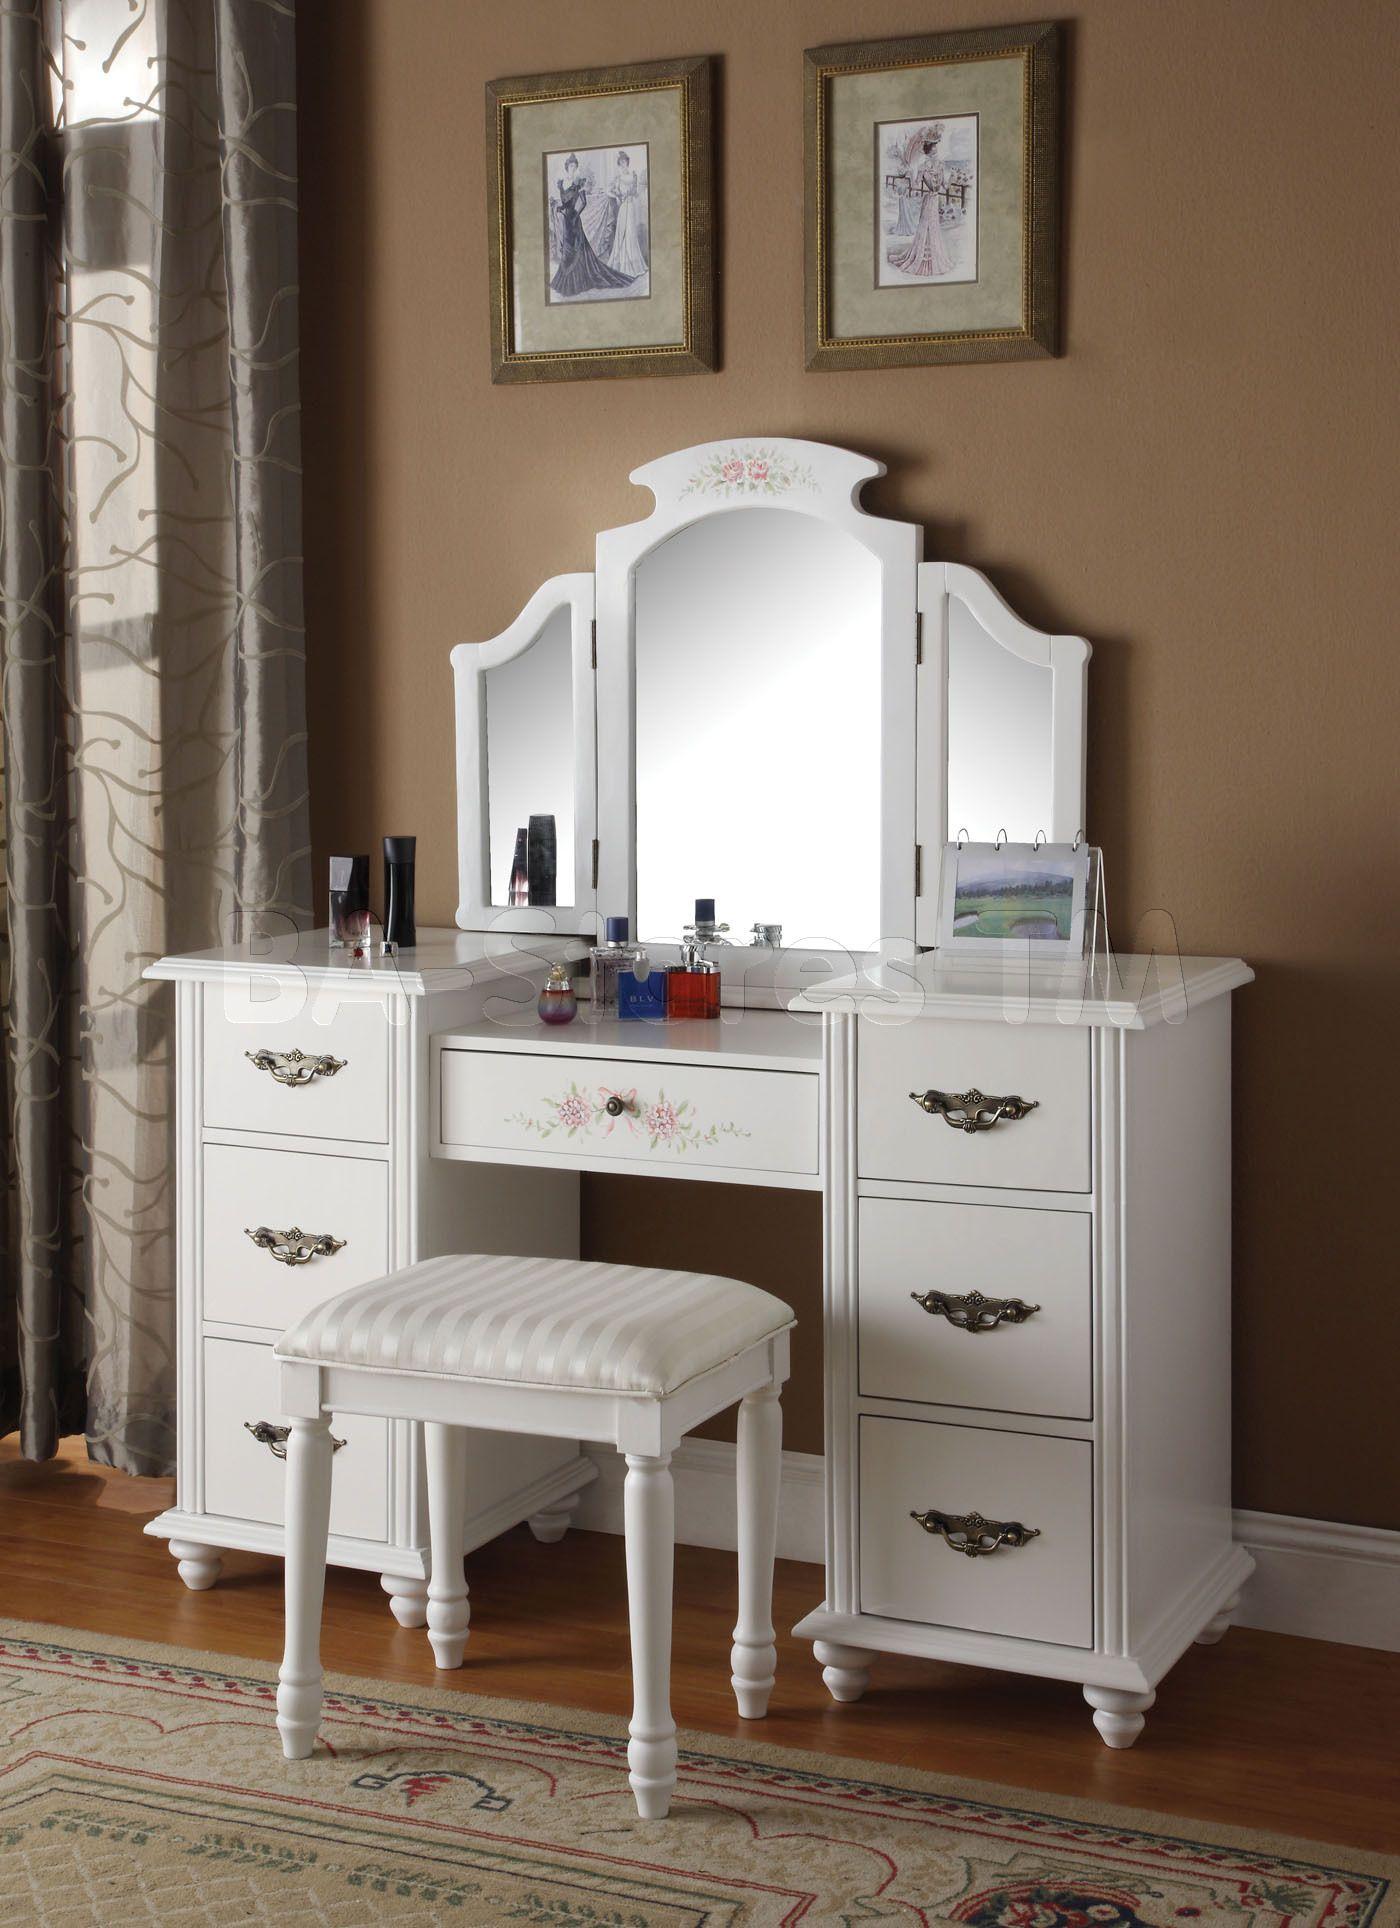 bedroom vanity | vanities and mirrors: torian white tri-fold vanity mirror COFXBYF